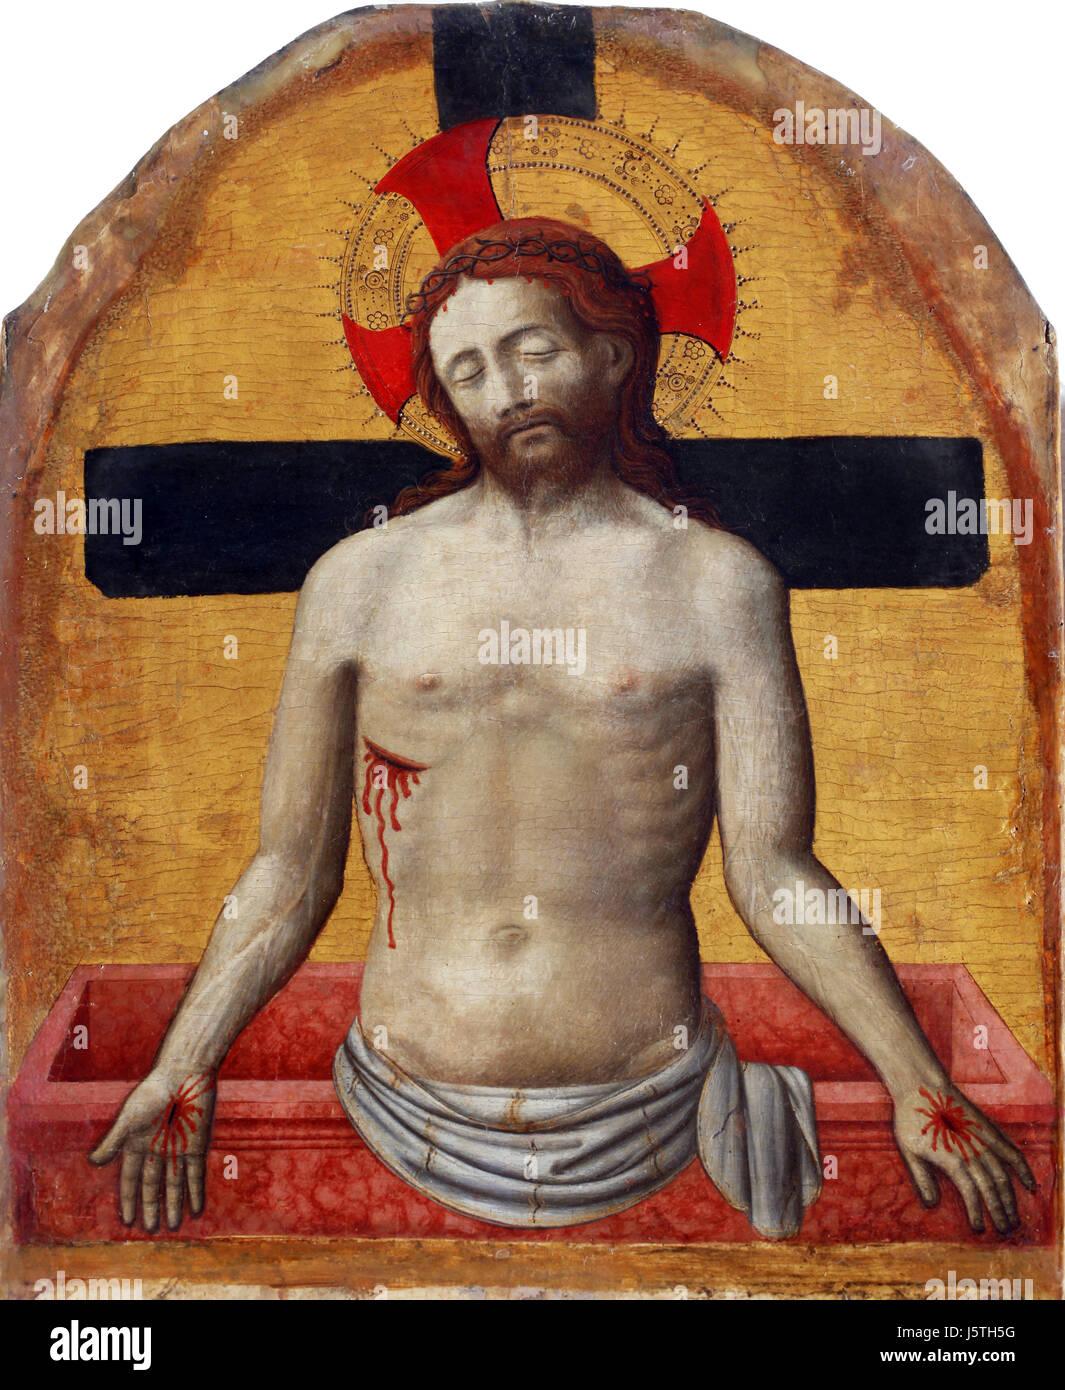 Antonio Vivarini: Imago pietatis, Retable de la basilique Euphrasienne de Porec, Croatie le 12 décembre Photo Stock